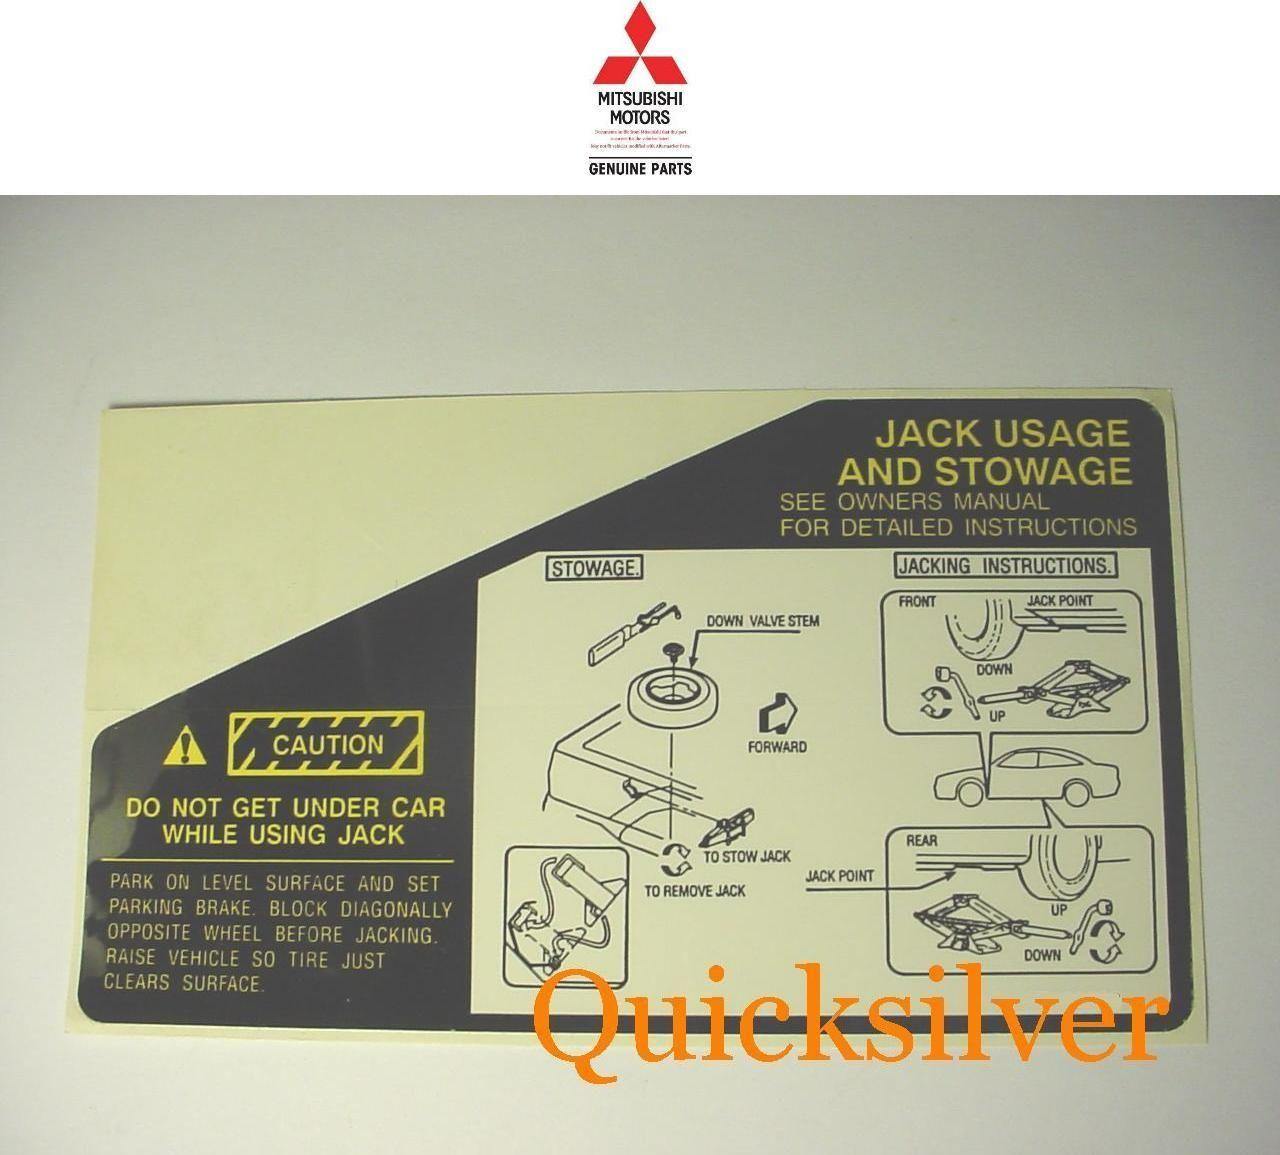 1995 1999 Eclipse Gsx Talon Tsi Awd Jacking Instructions Decal New Oem On Ebid United States 161273224 Eclipse Gsx Gsx Awd